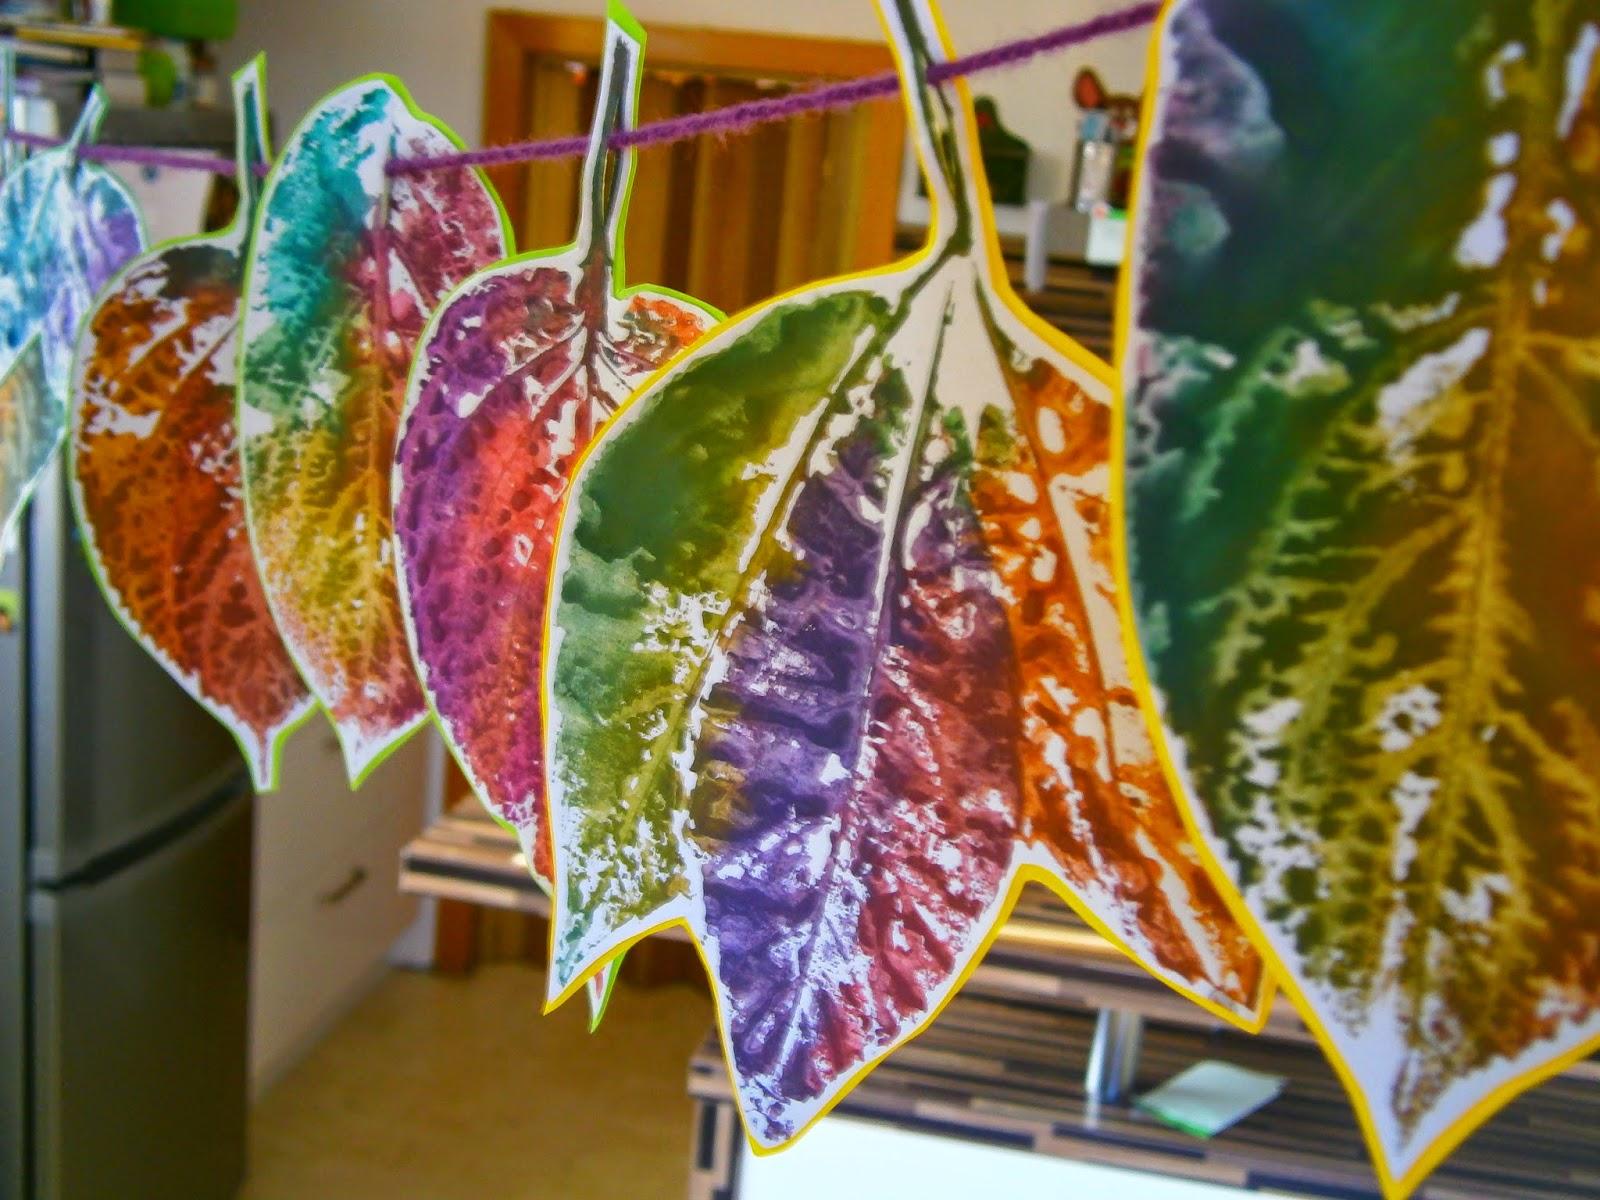 Unsre kinder unser leben regenbogen bl tter - Herbstdeko kindergarten ...